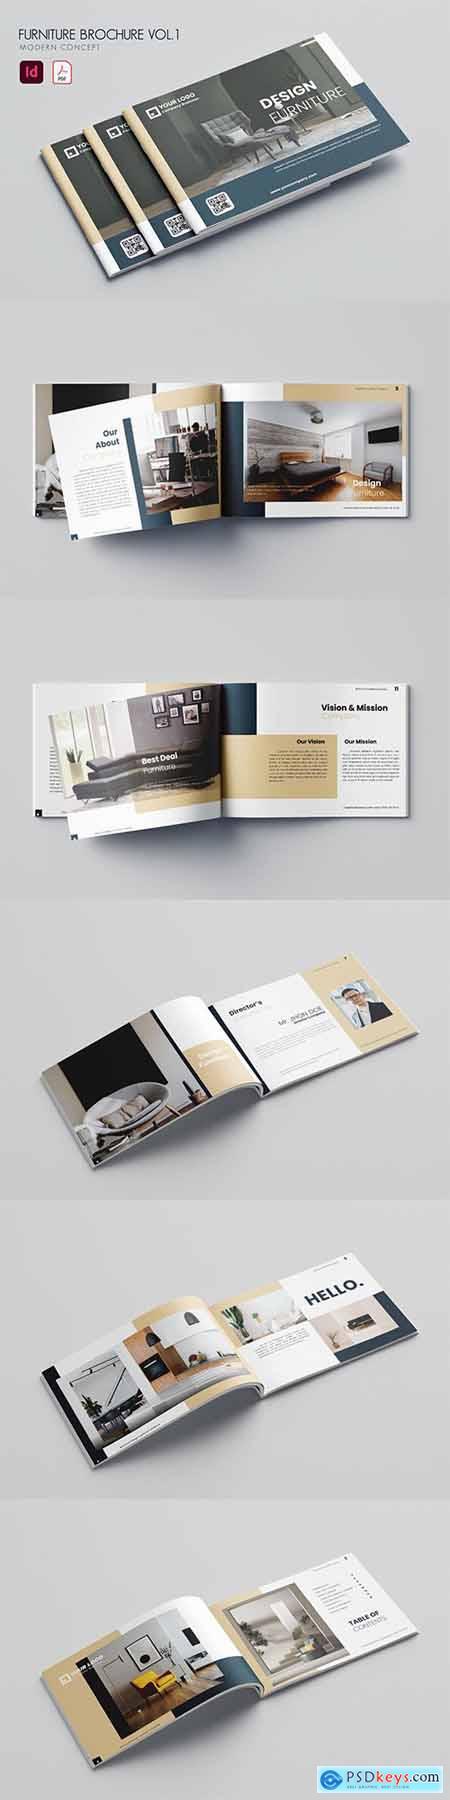 Furniture Brochure Vol.1 NXNRYMN